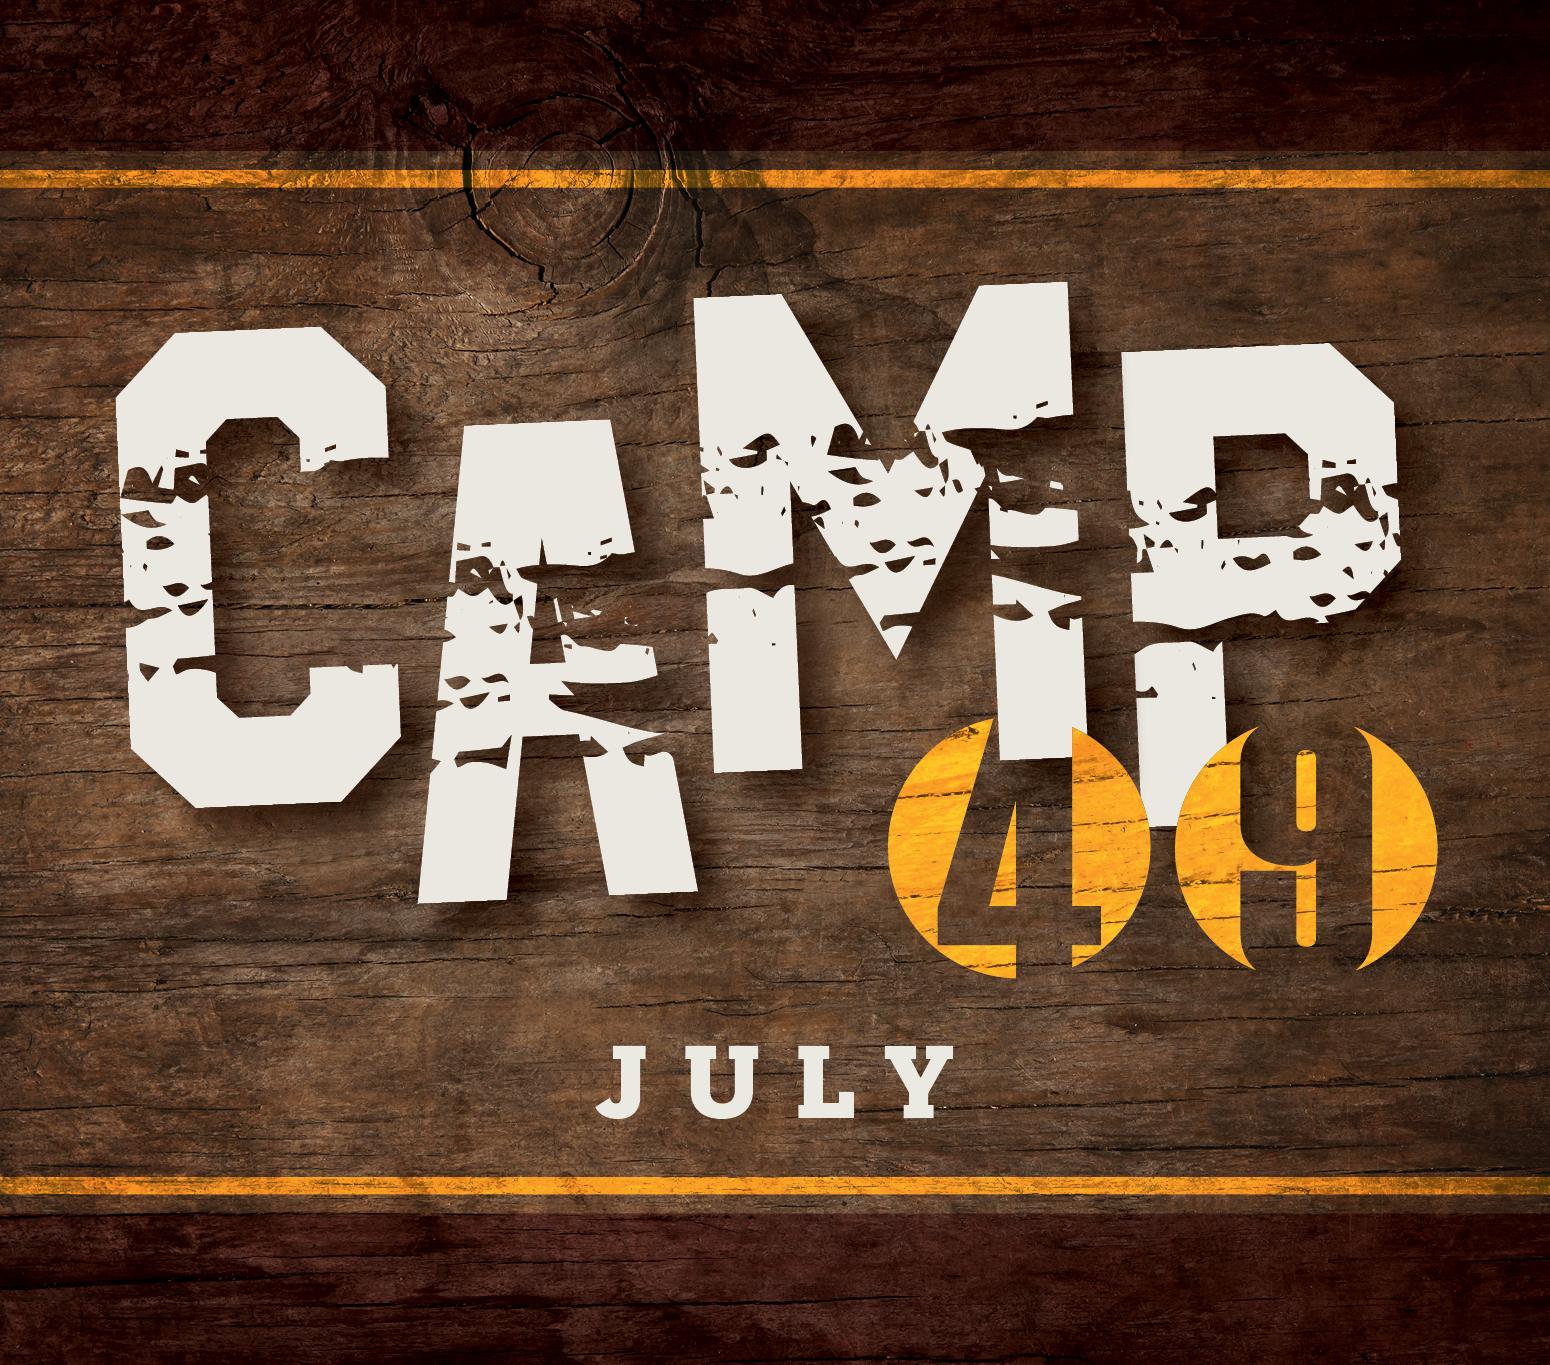 Camp 49 July